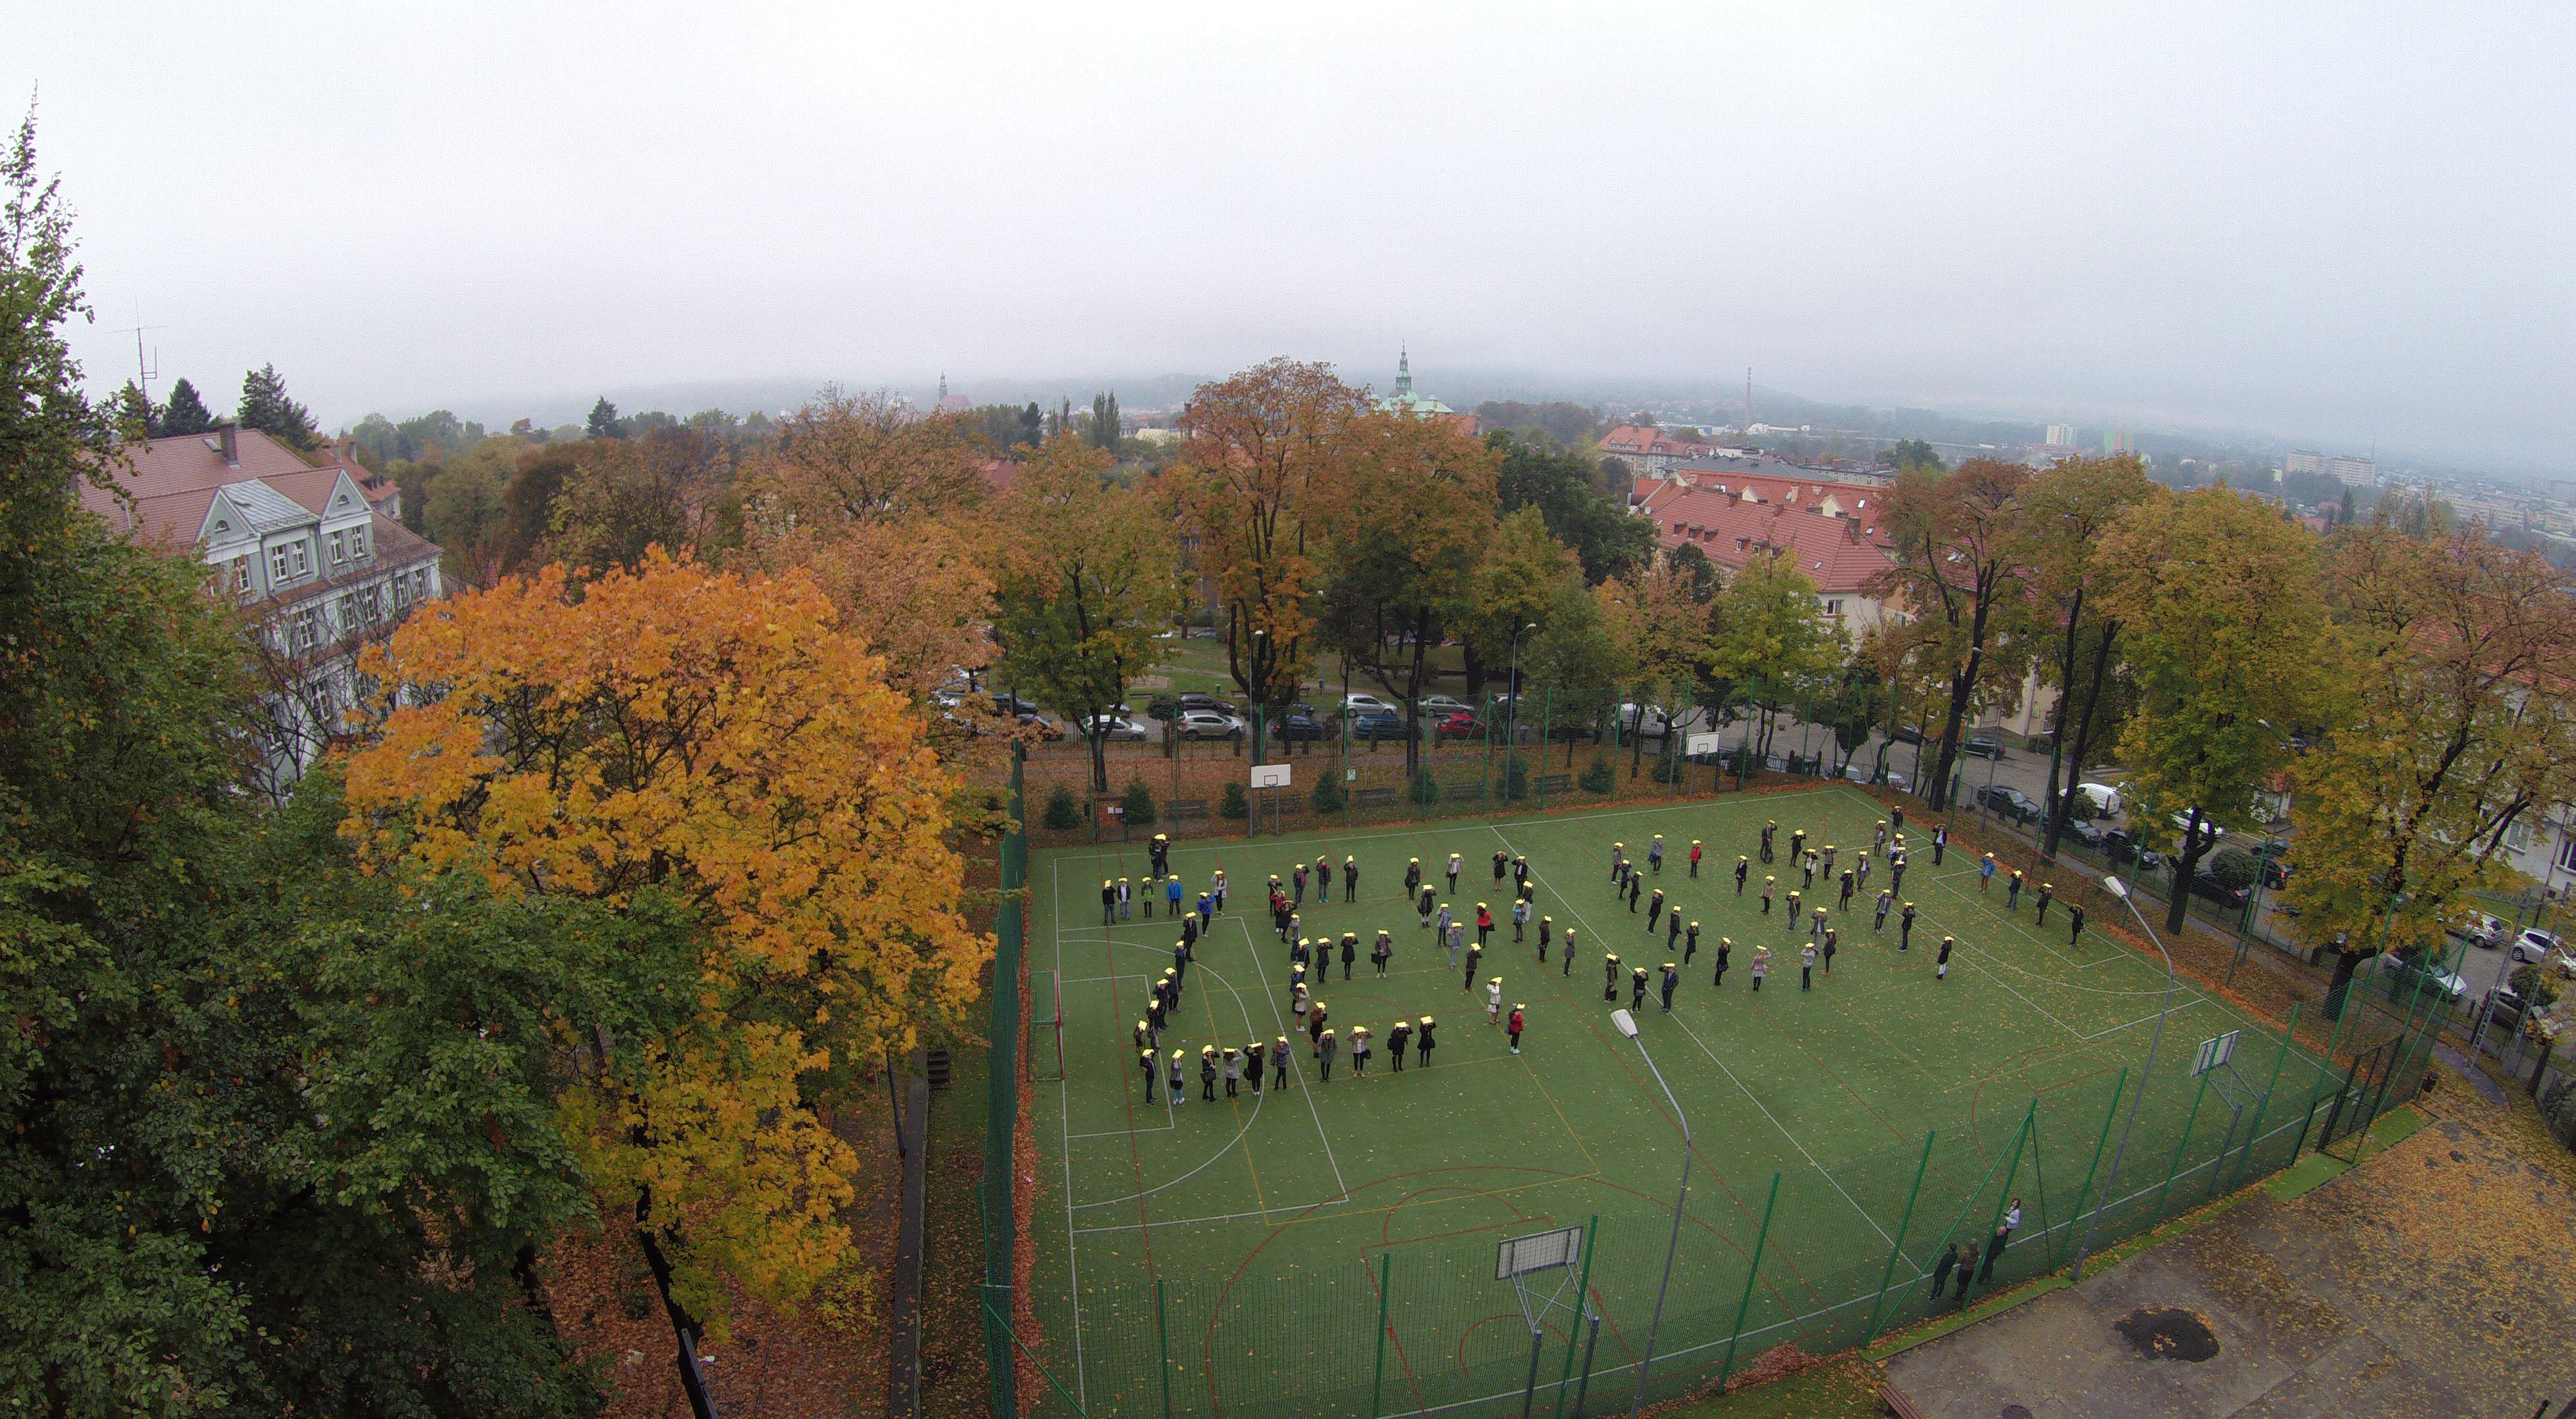 fot. Konrad Zaprucki